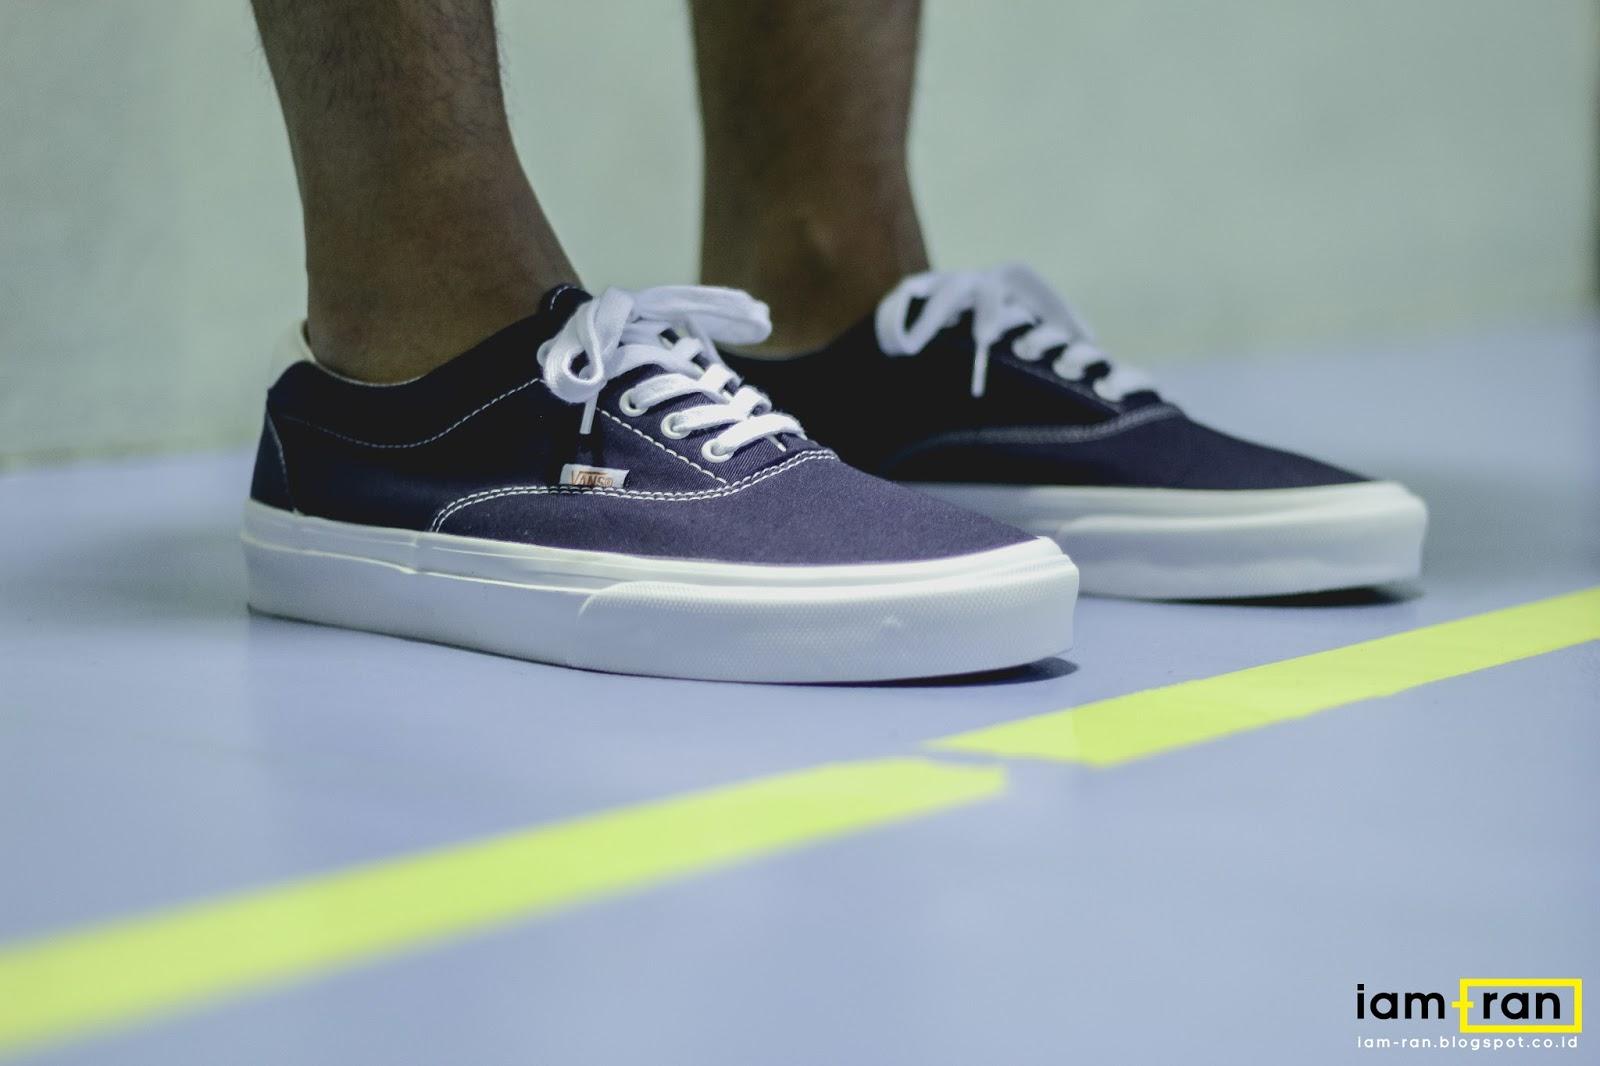 f0ffb821fa2e74 Anggie Raditya on feet. Sneakers   Vans Era X Beams (40th Anniversary).  Photo by  iam.ran06